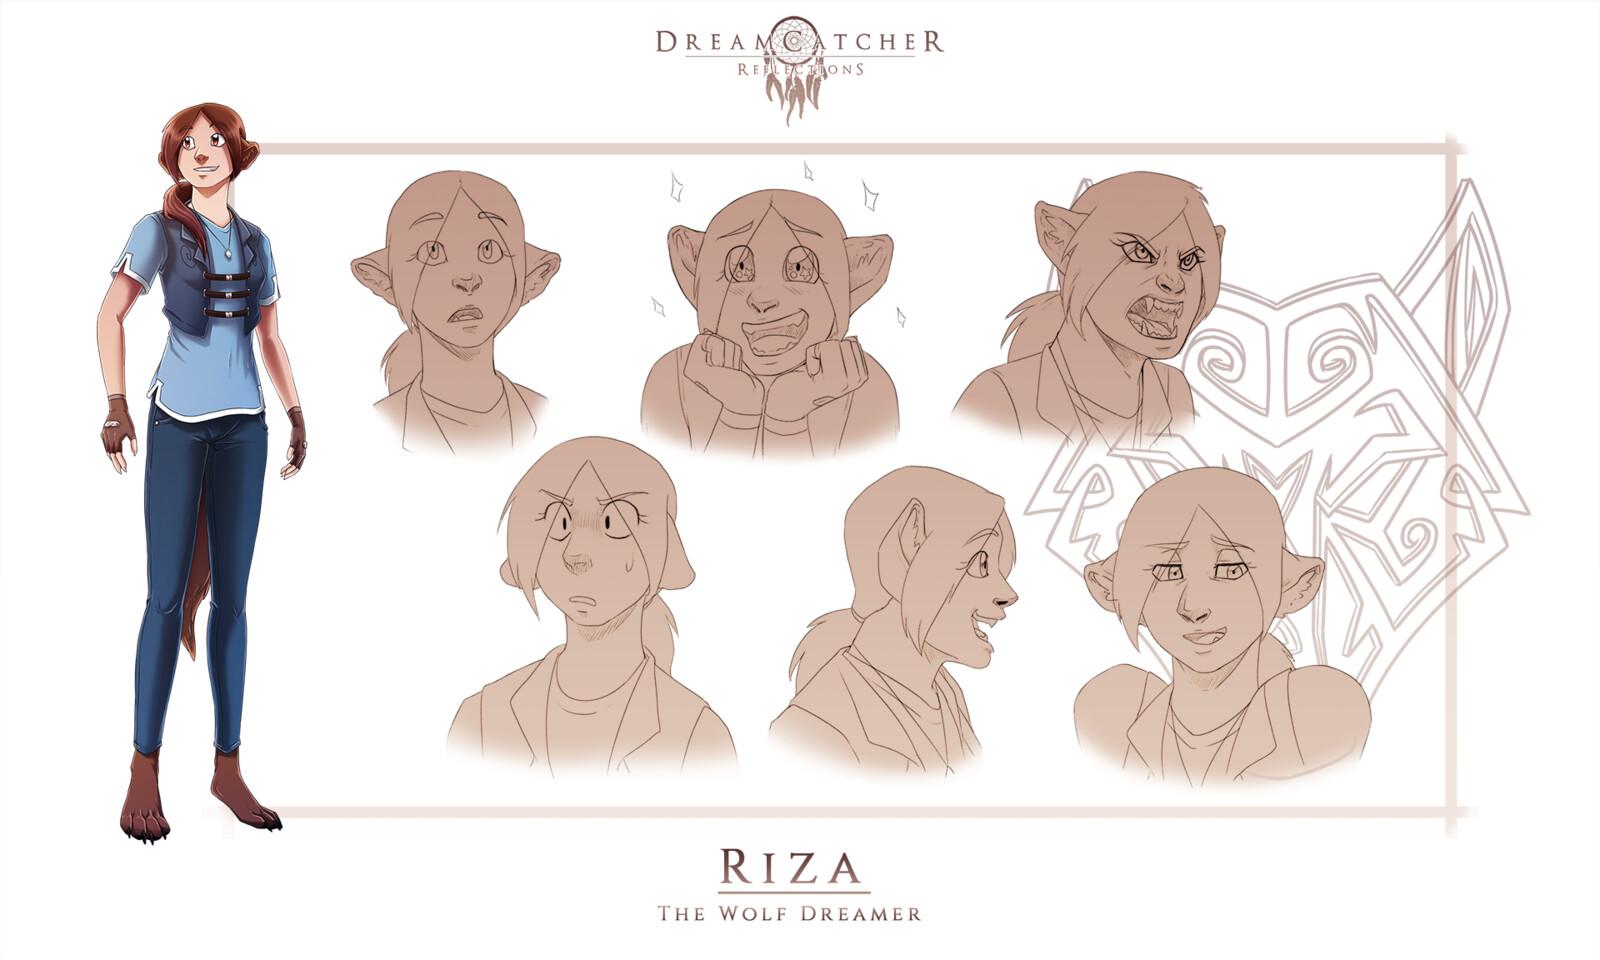 DreamCatcher: Reflections - Riza Ref